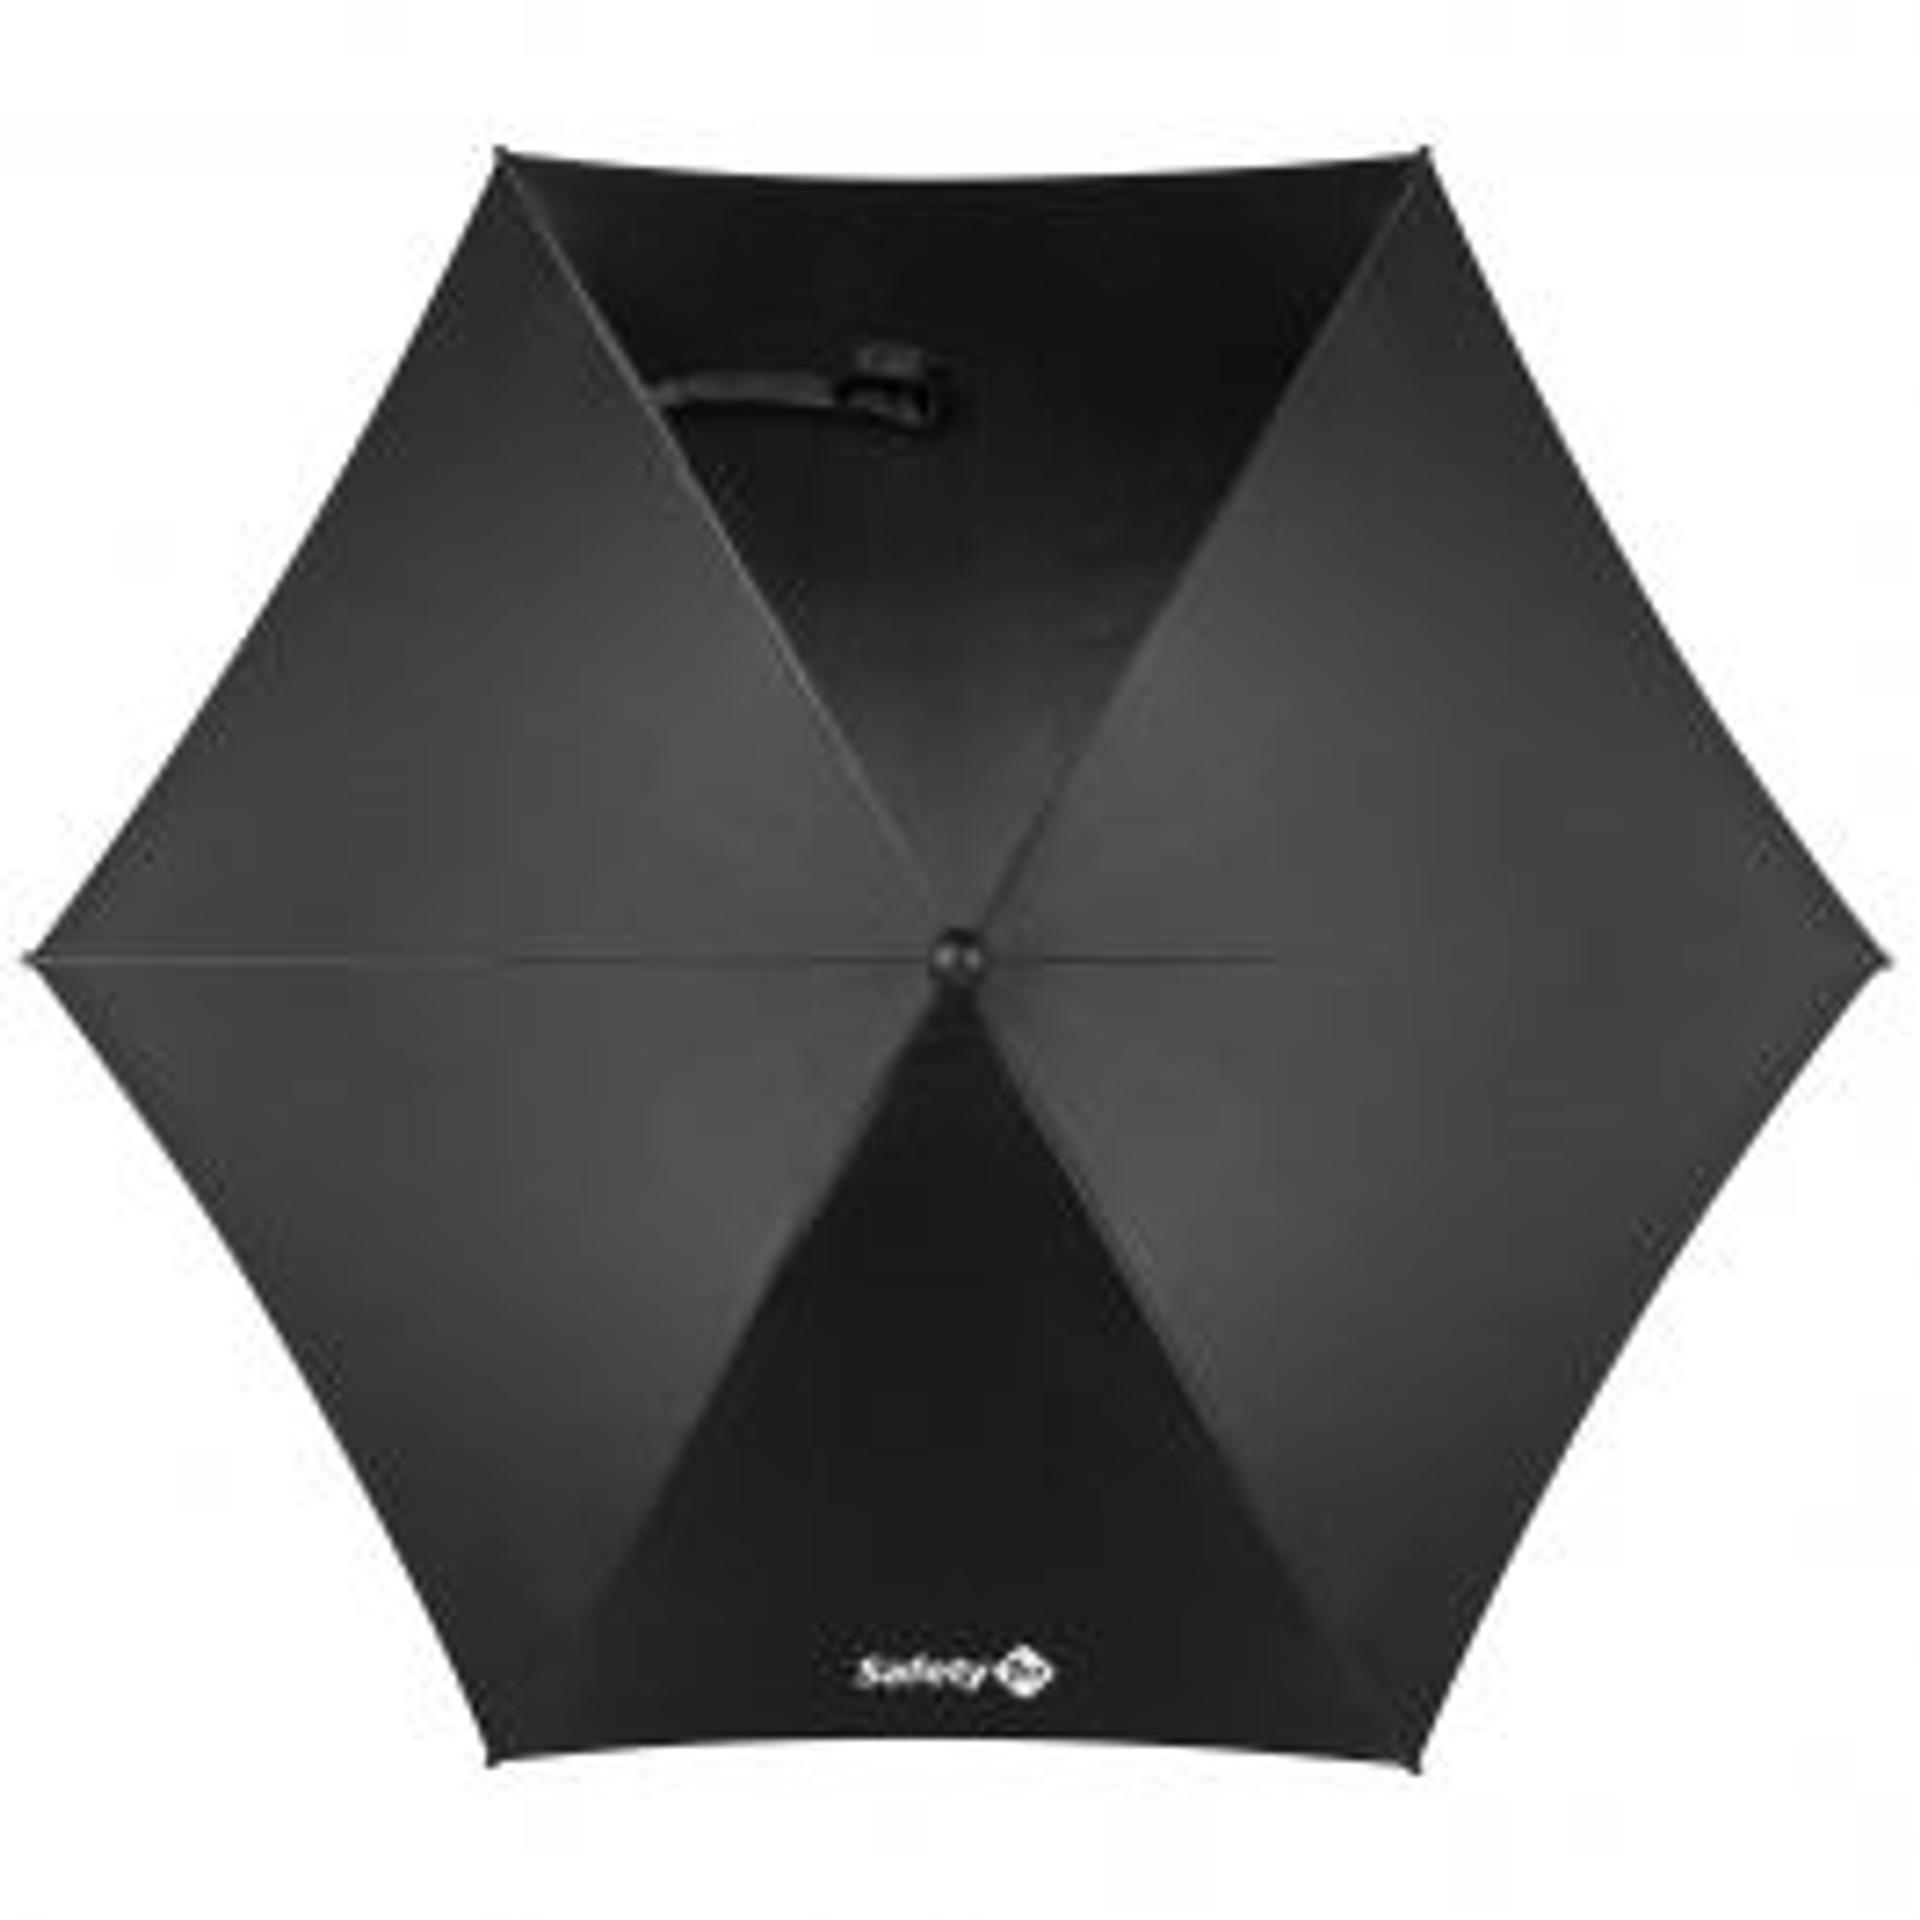 Safety 1st Universal Parasol - Black